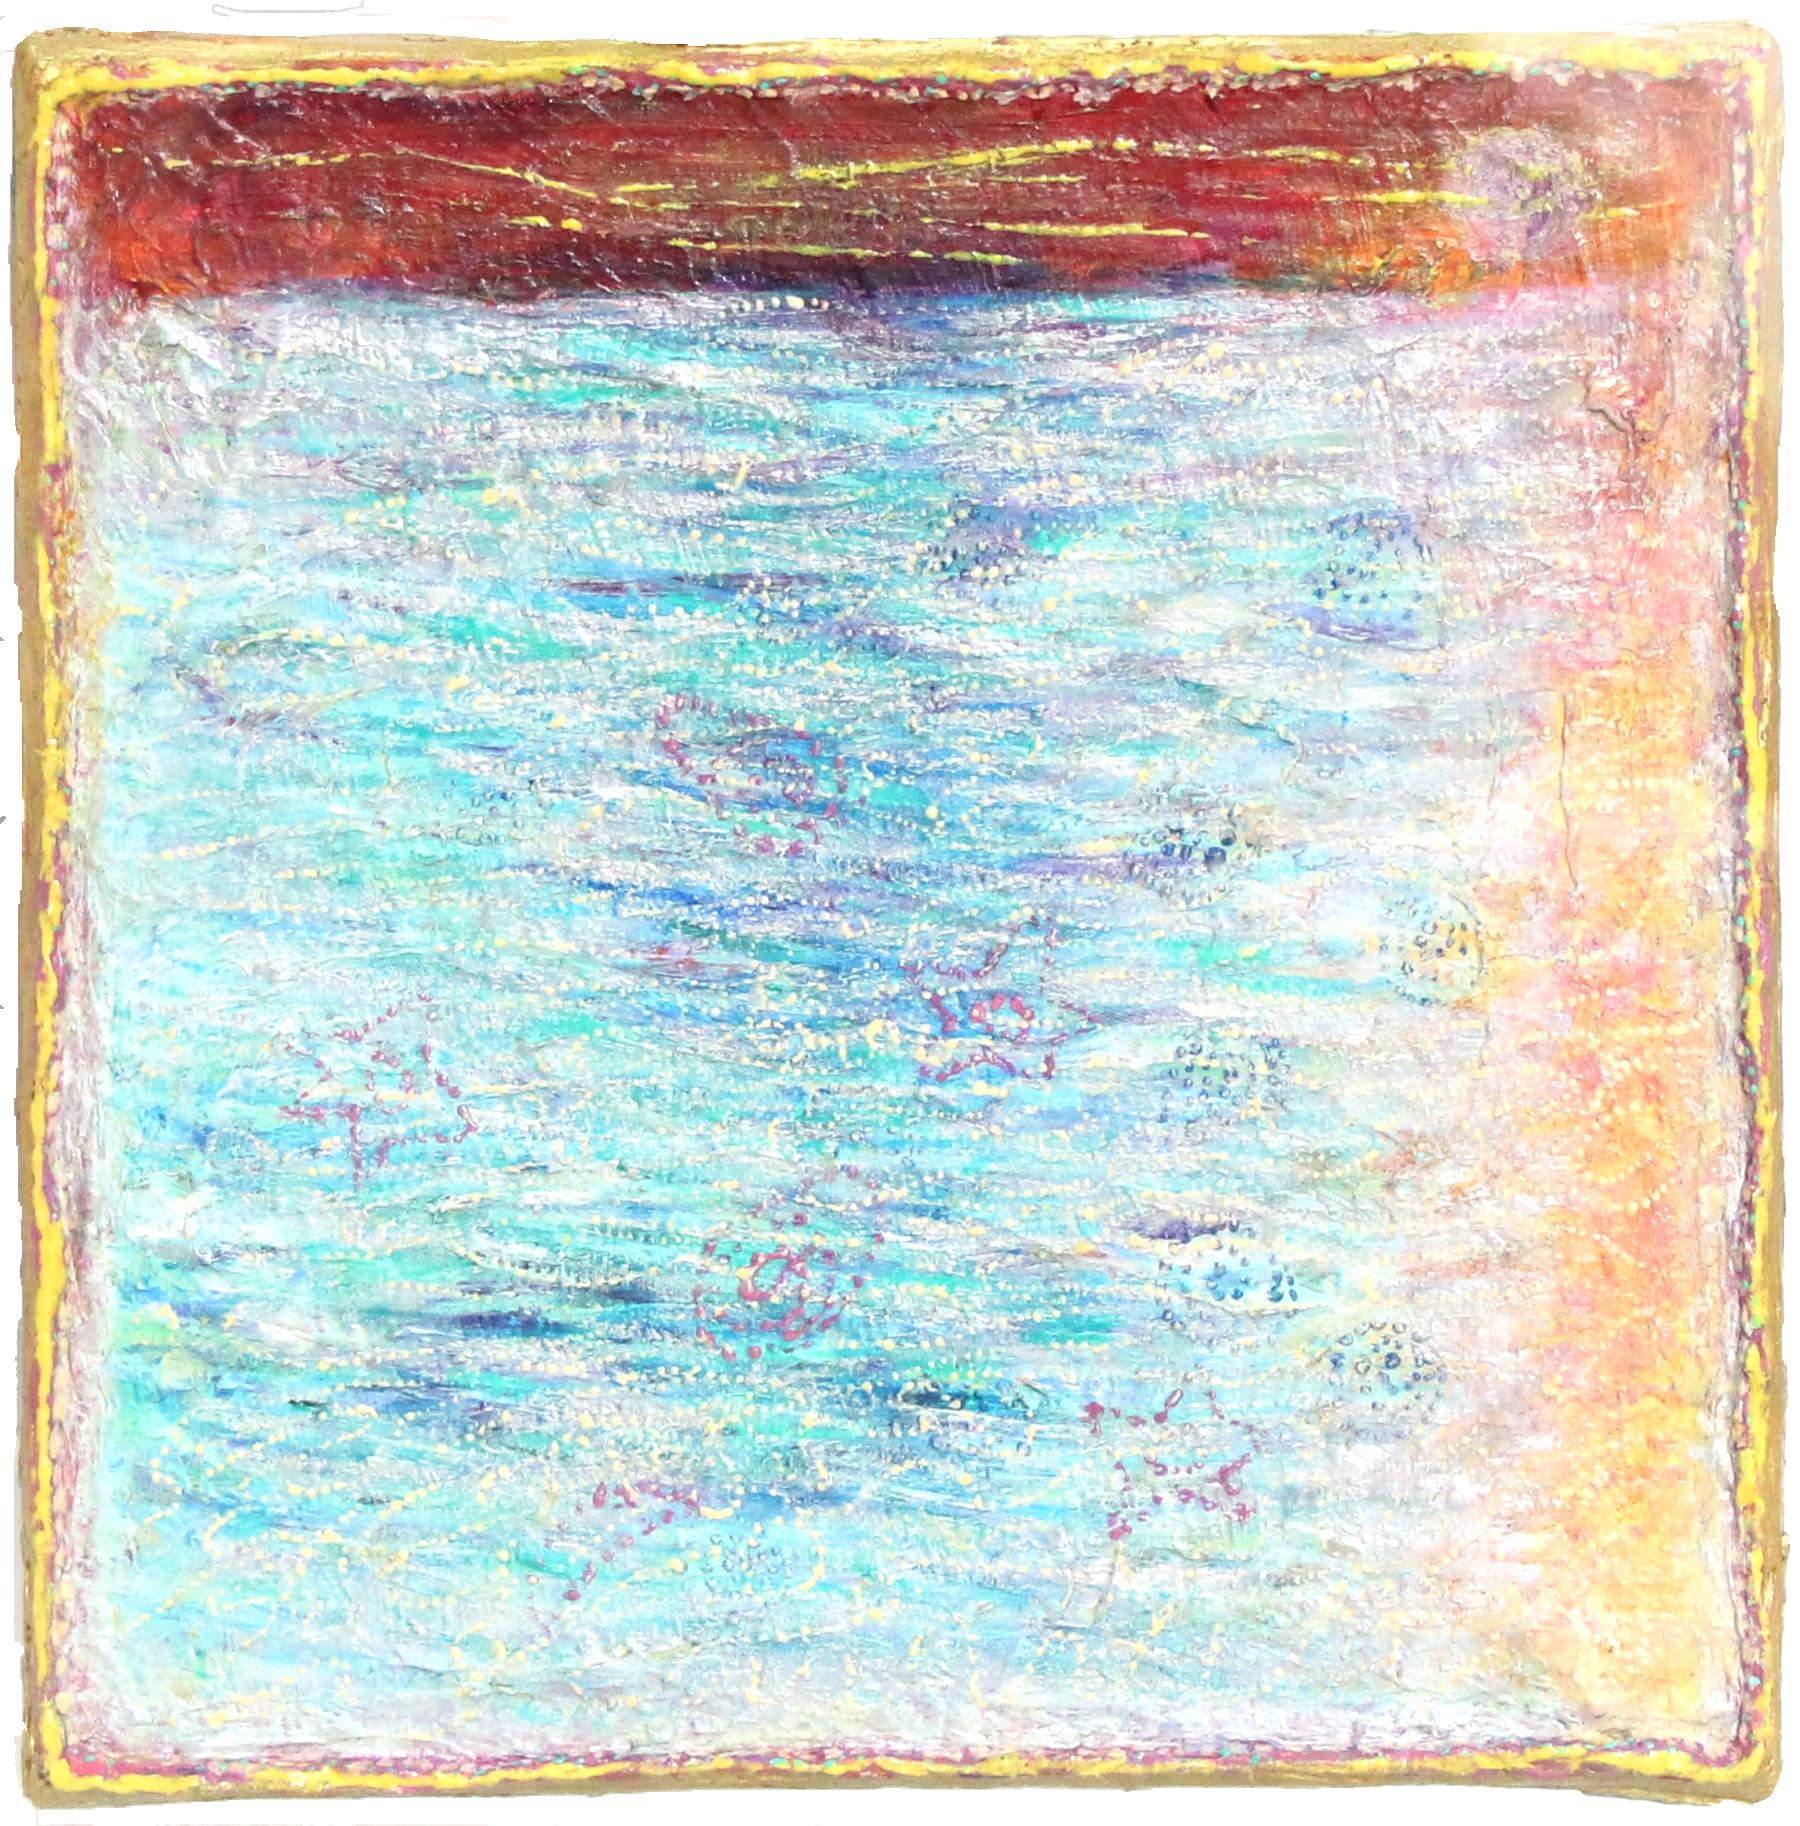 59.海辺